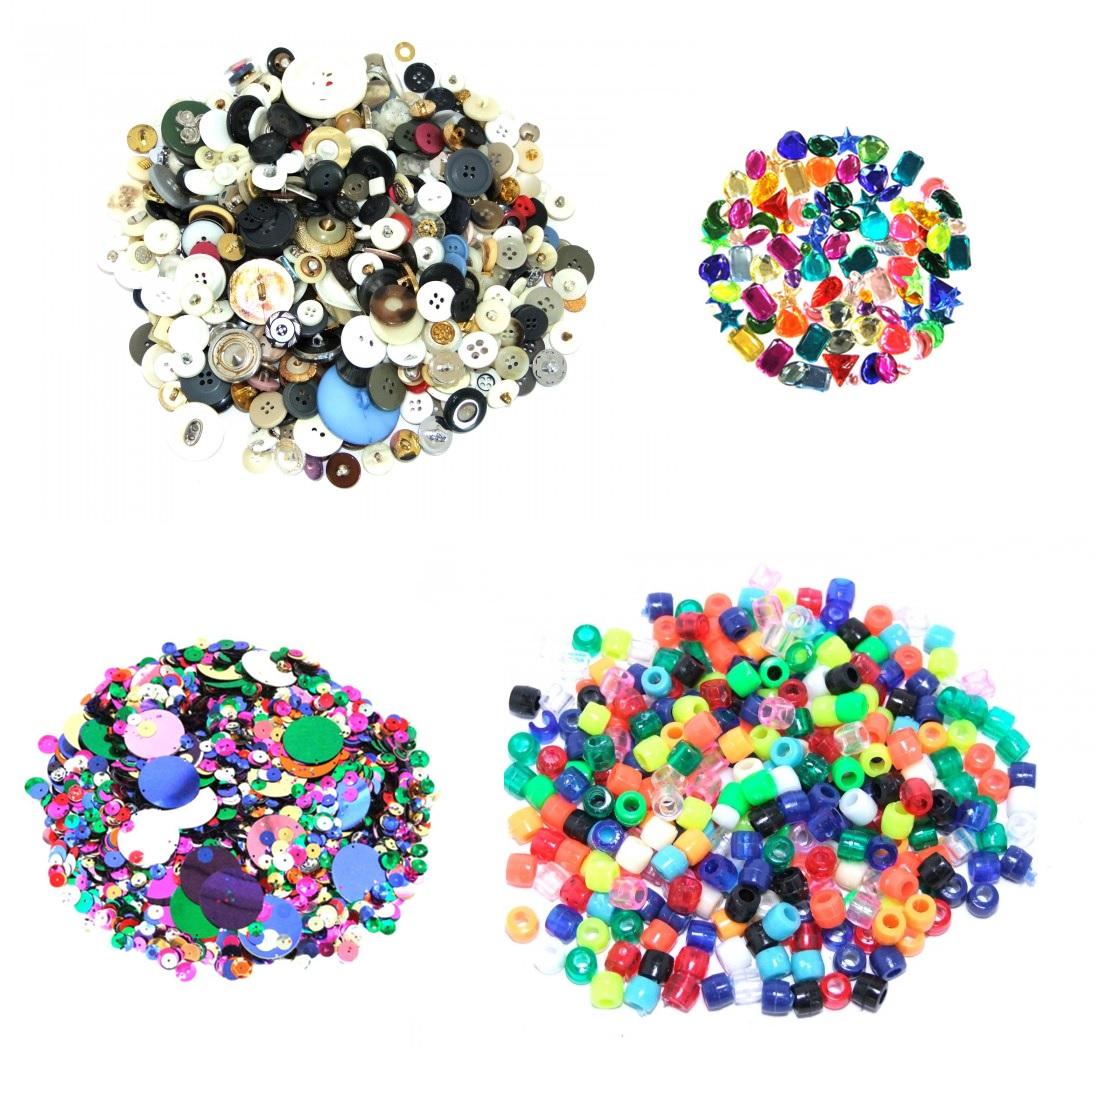 Sequins, Beads & Buttons